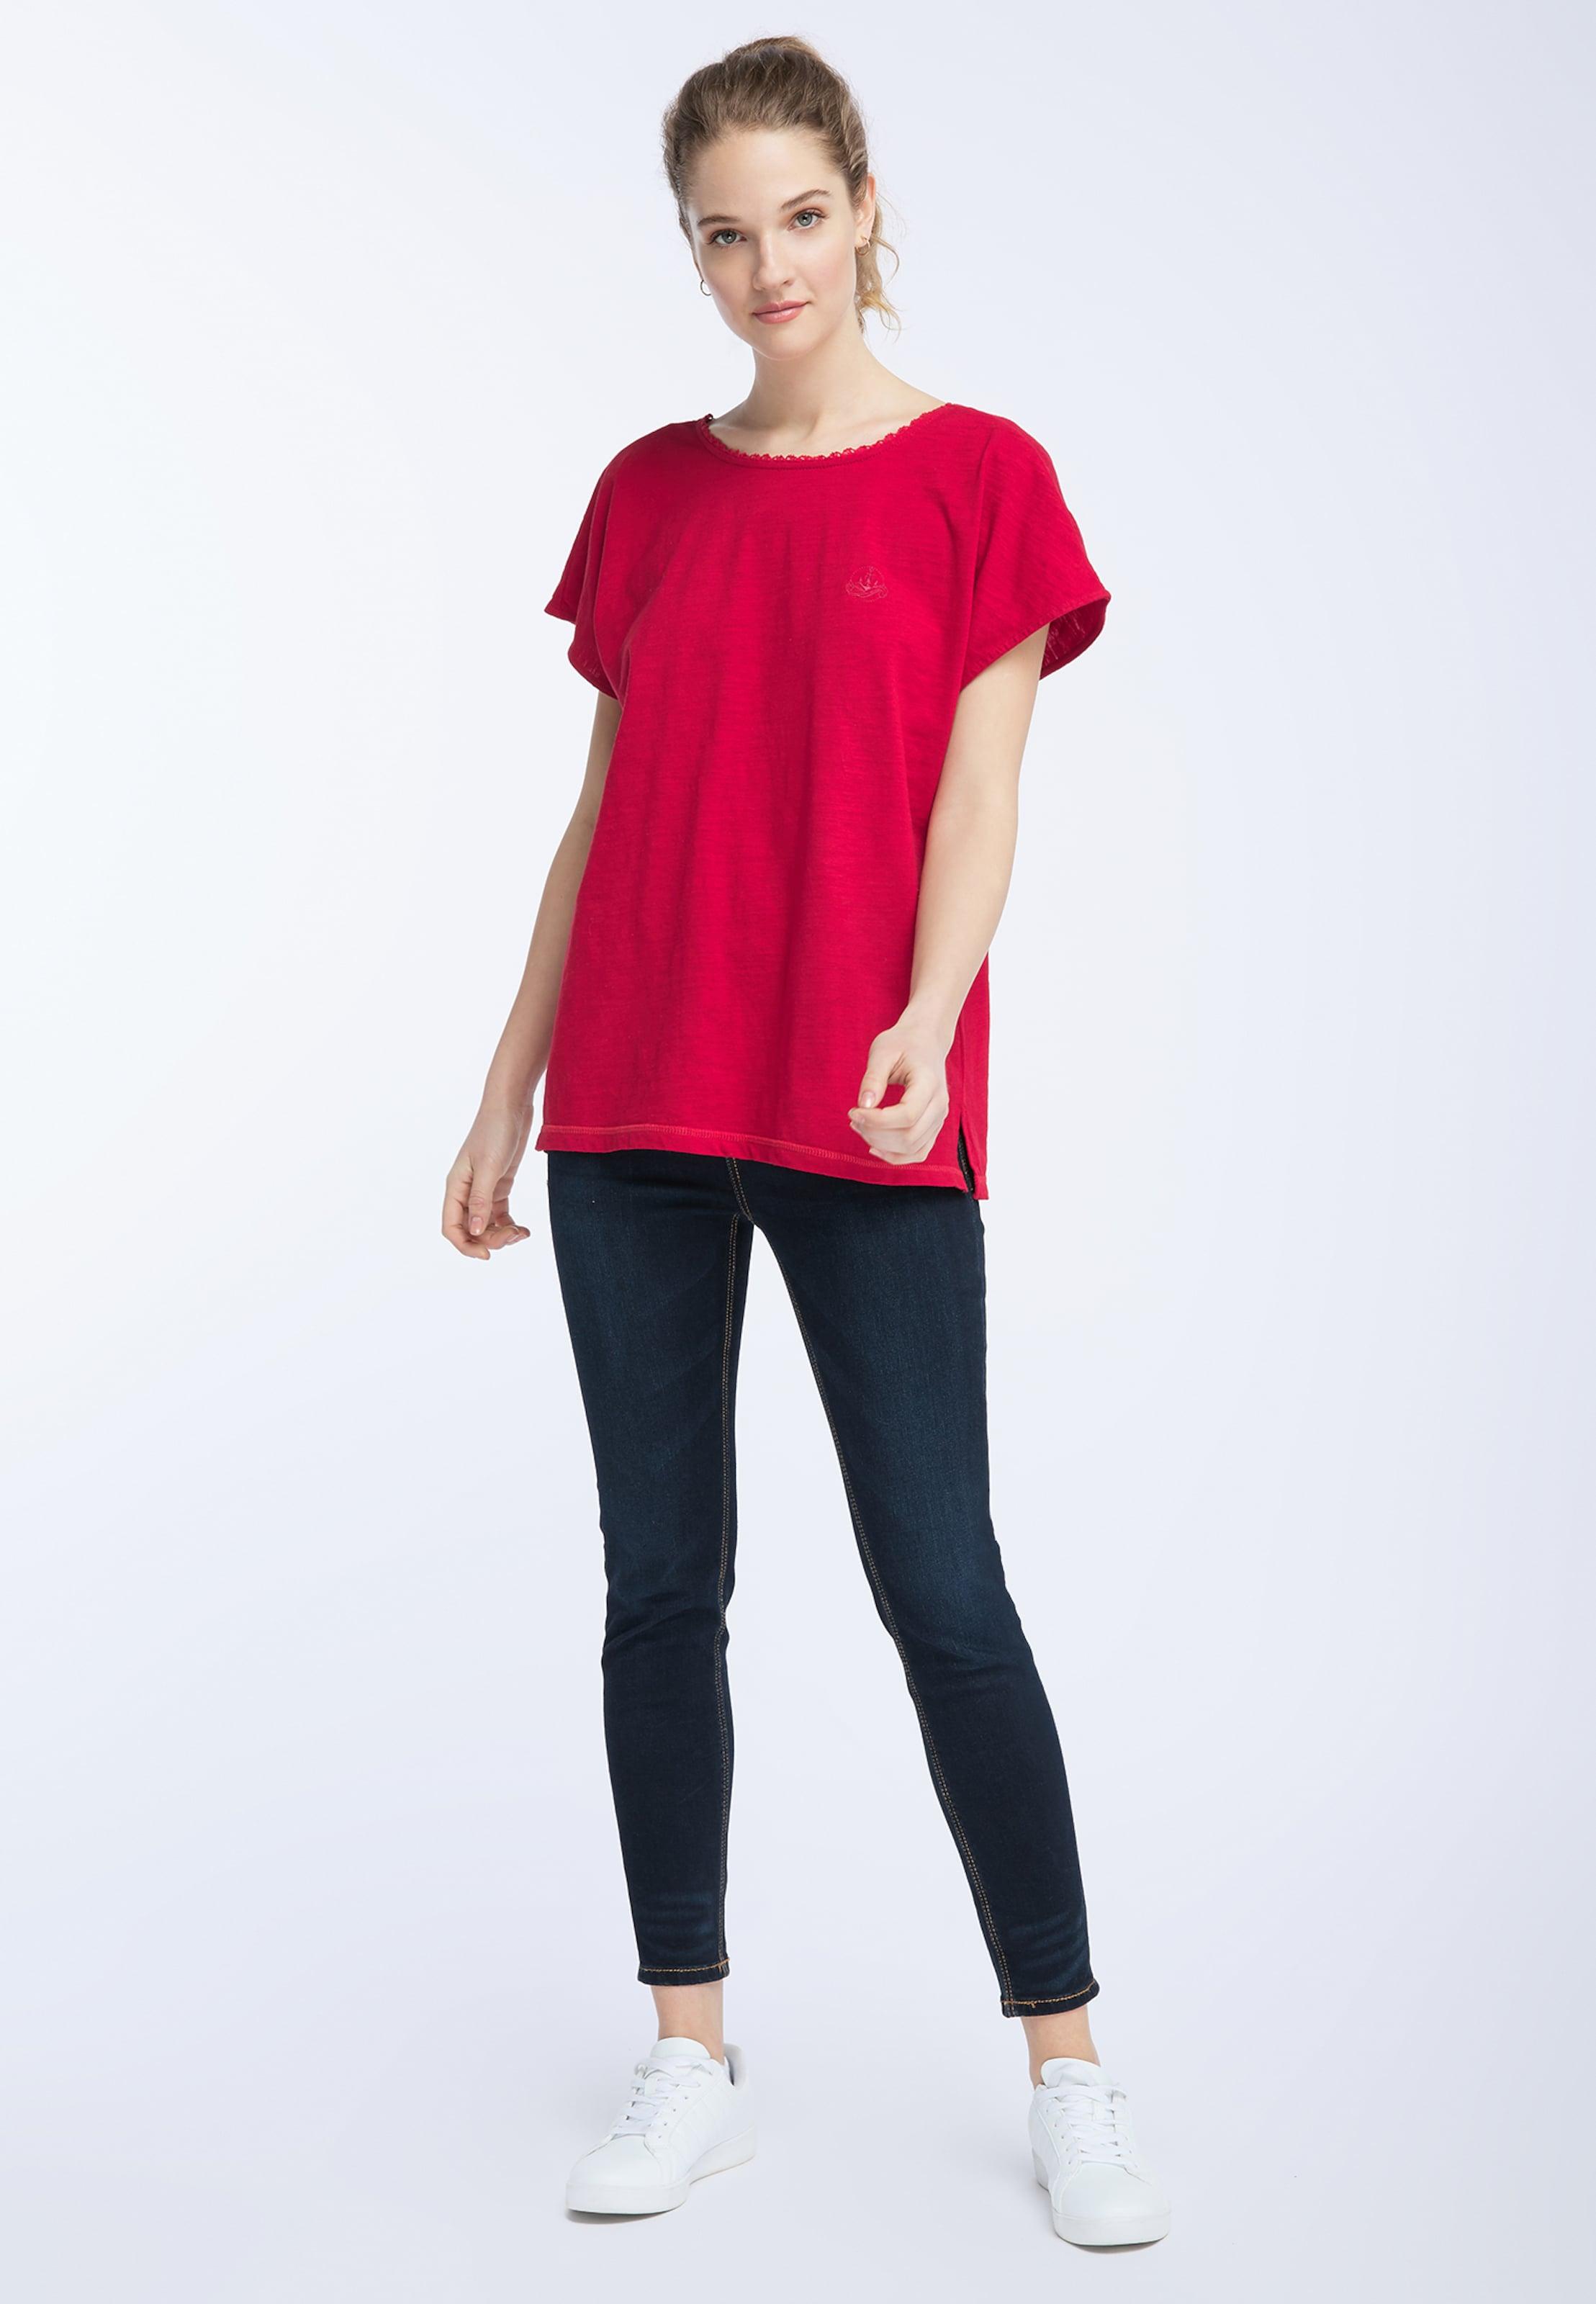 Dreimaster T Dreimaster shirt Rouge En T shirt En Rouge cT5lFKJu13